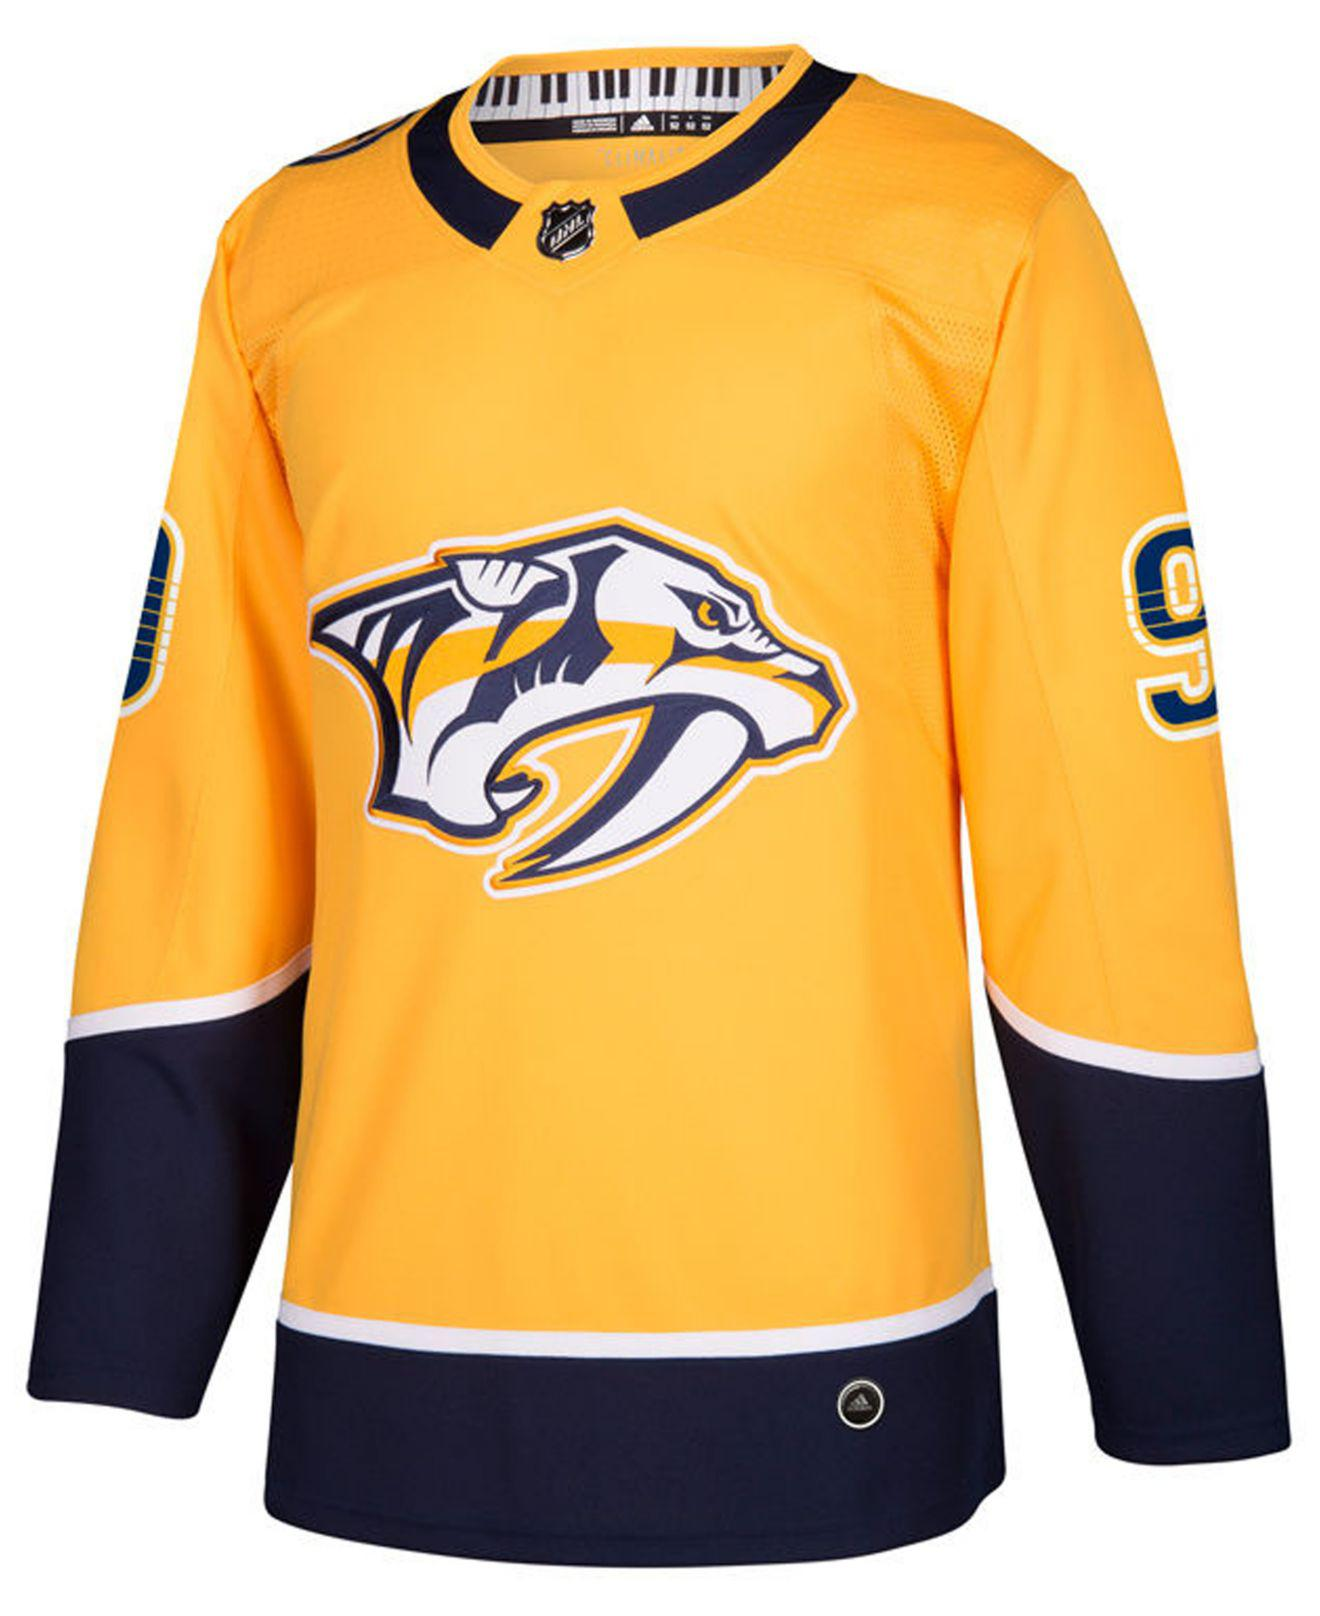 04532c7b105 Lyst - adidas Filip Forsberg Nashville Predators Adizero Authentic Pro  Player Jersey in Yellow for Men